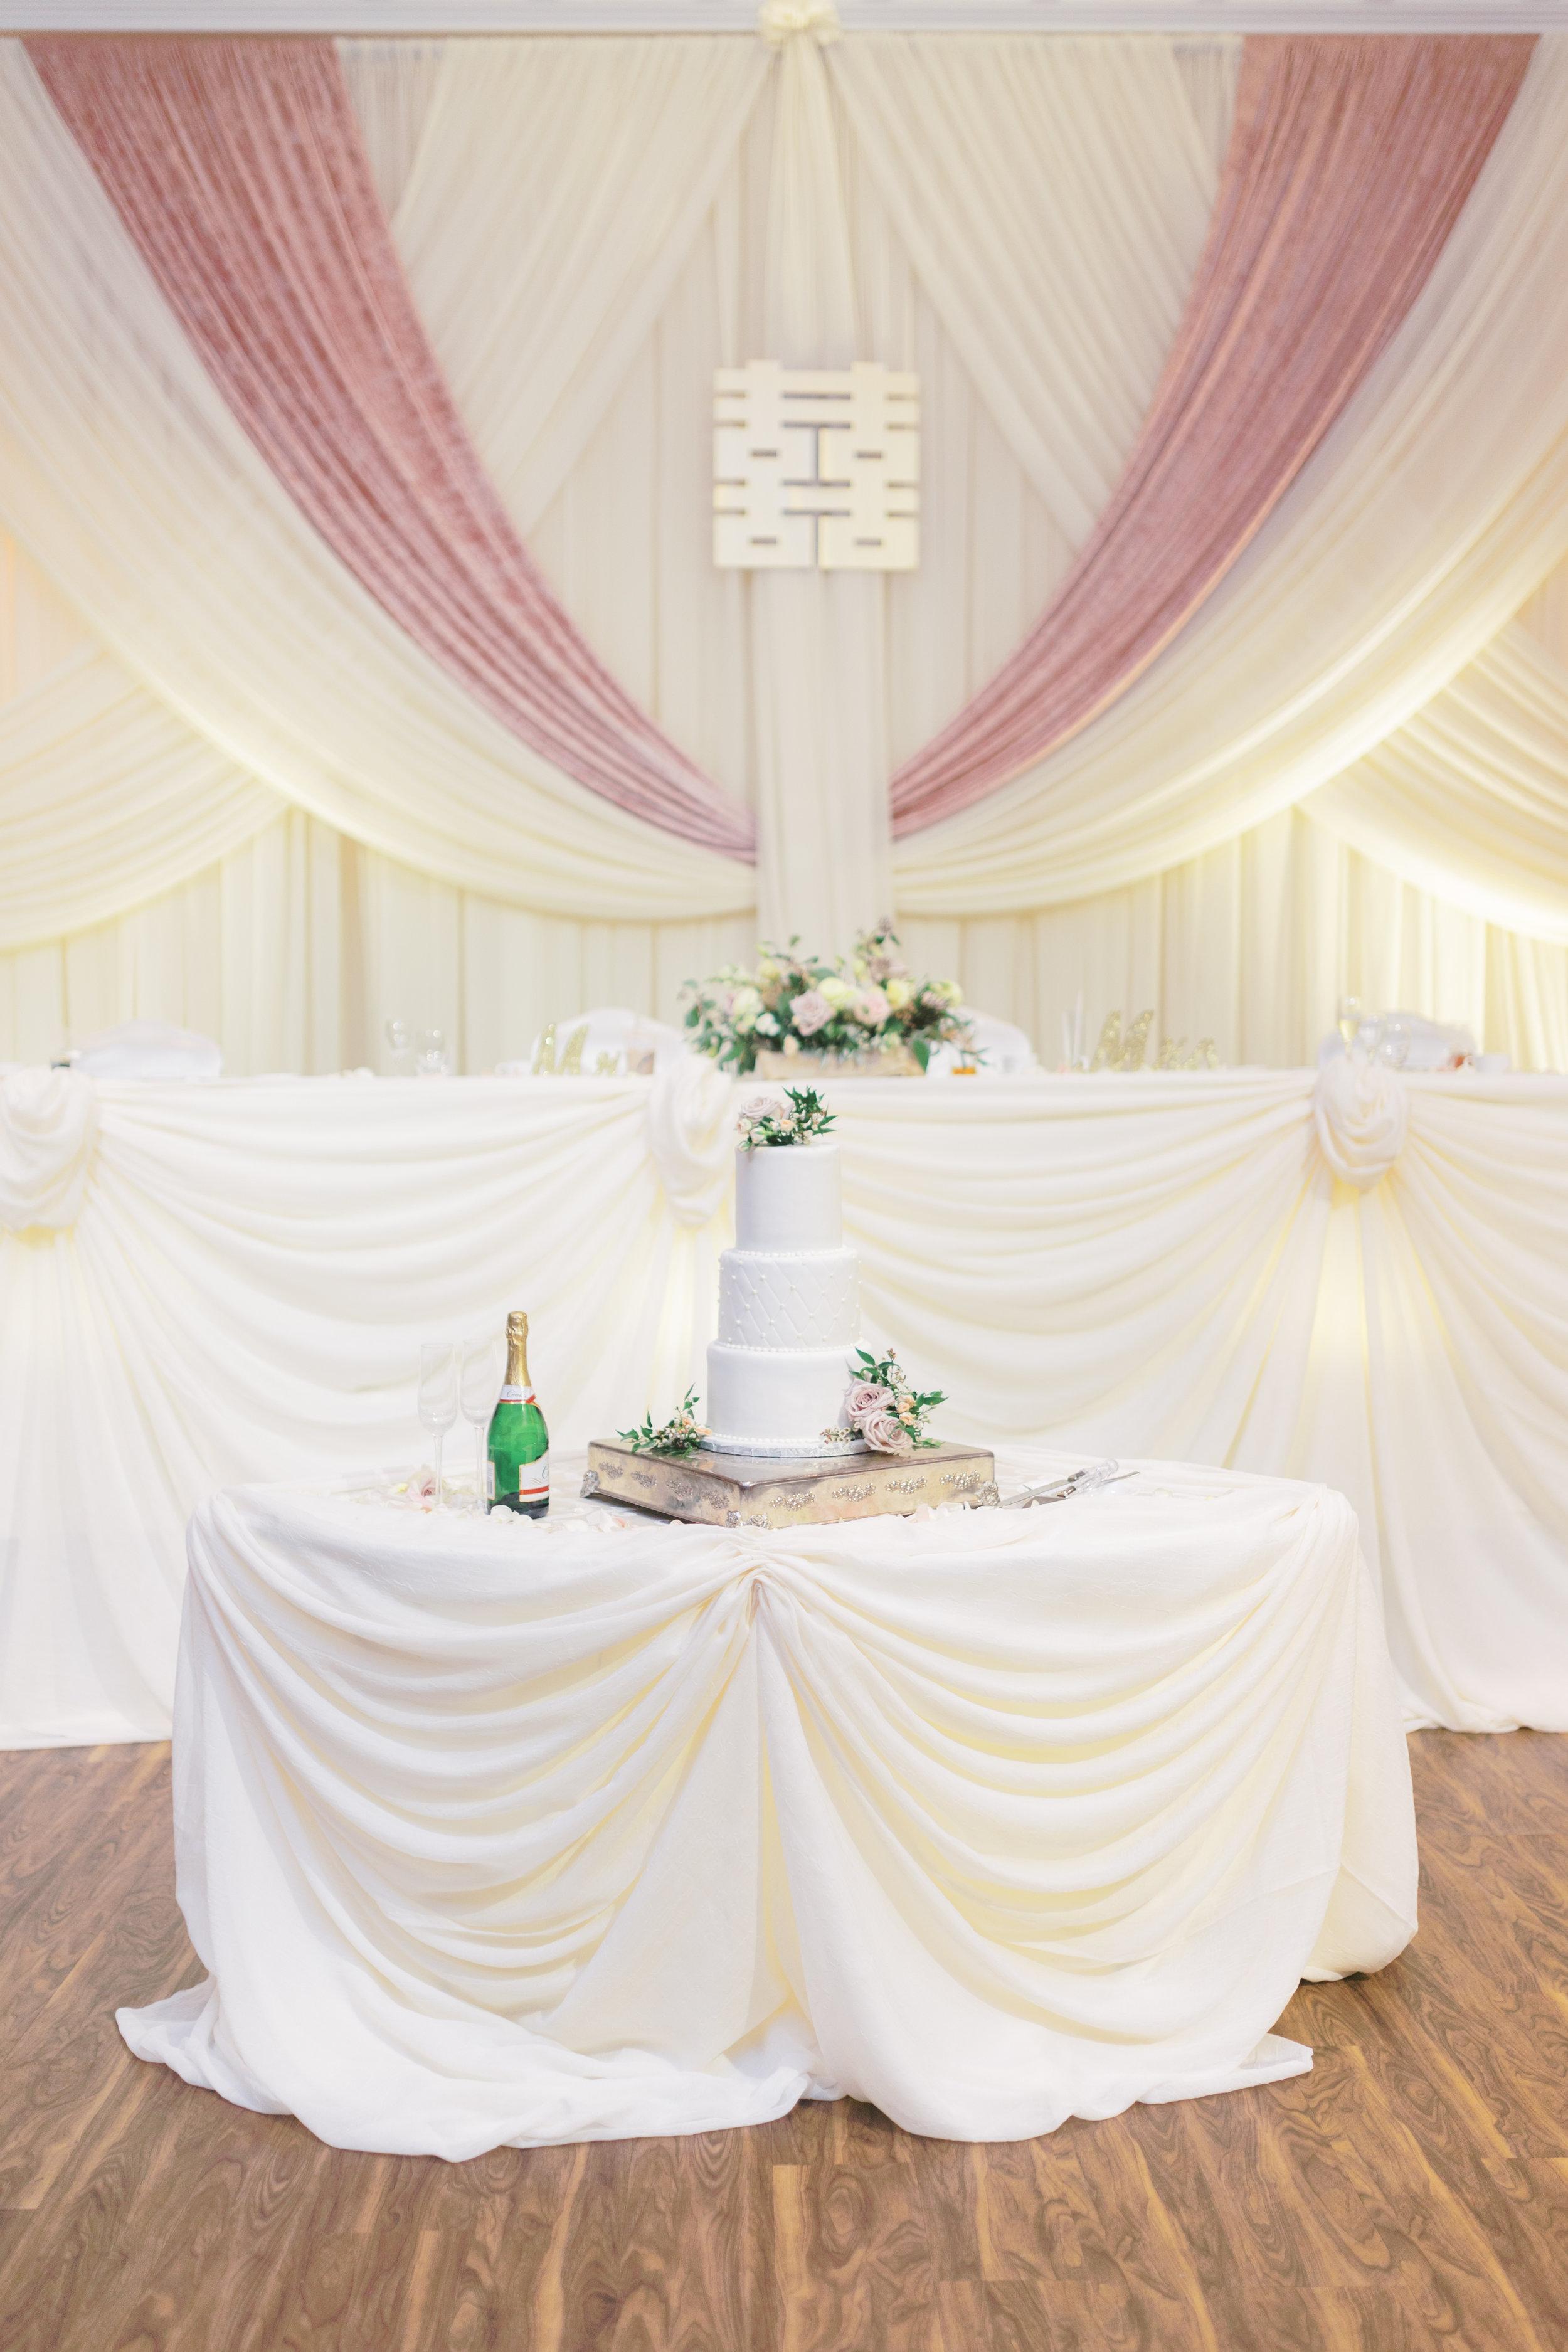 Markham Event Center Wedding-Reception-5.jpg